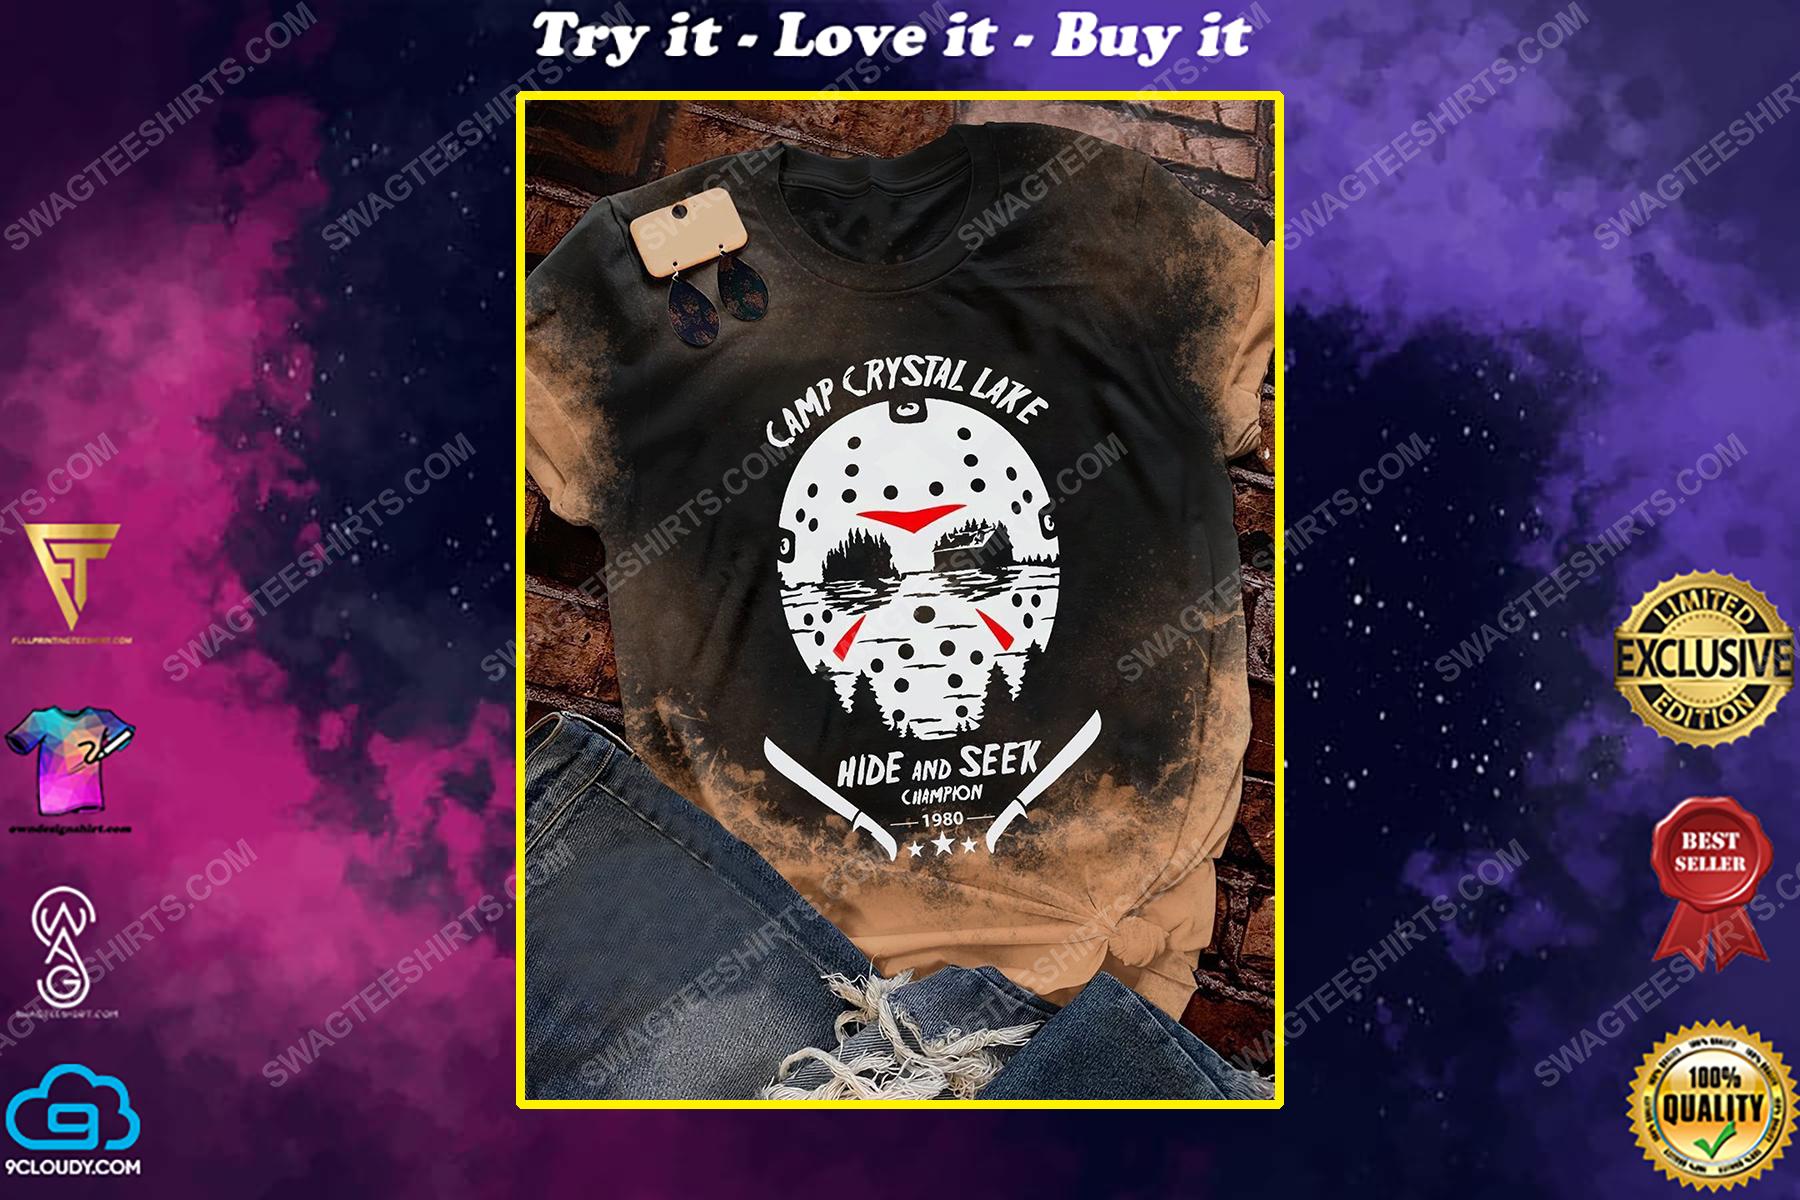 Halloween jason camp crystal lake hide and seek champion shirt